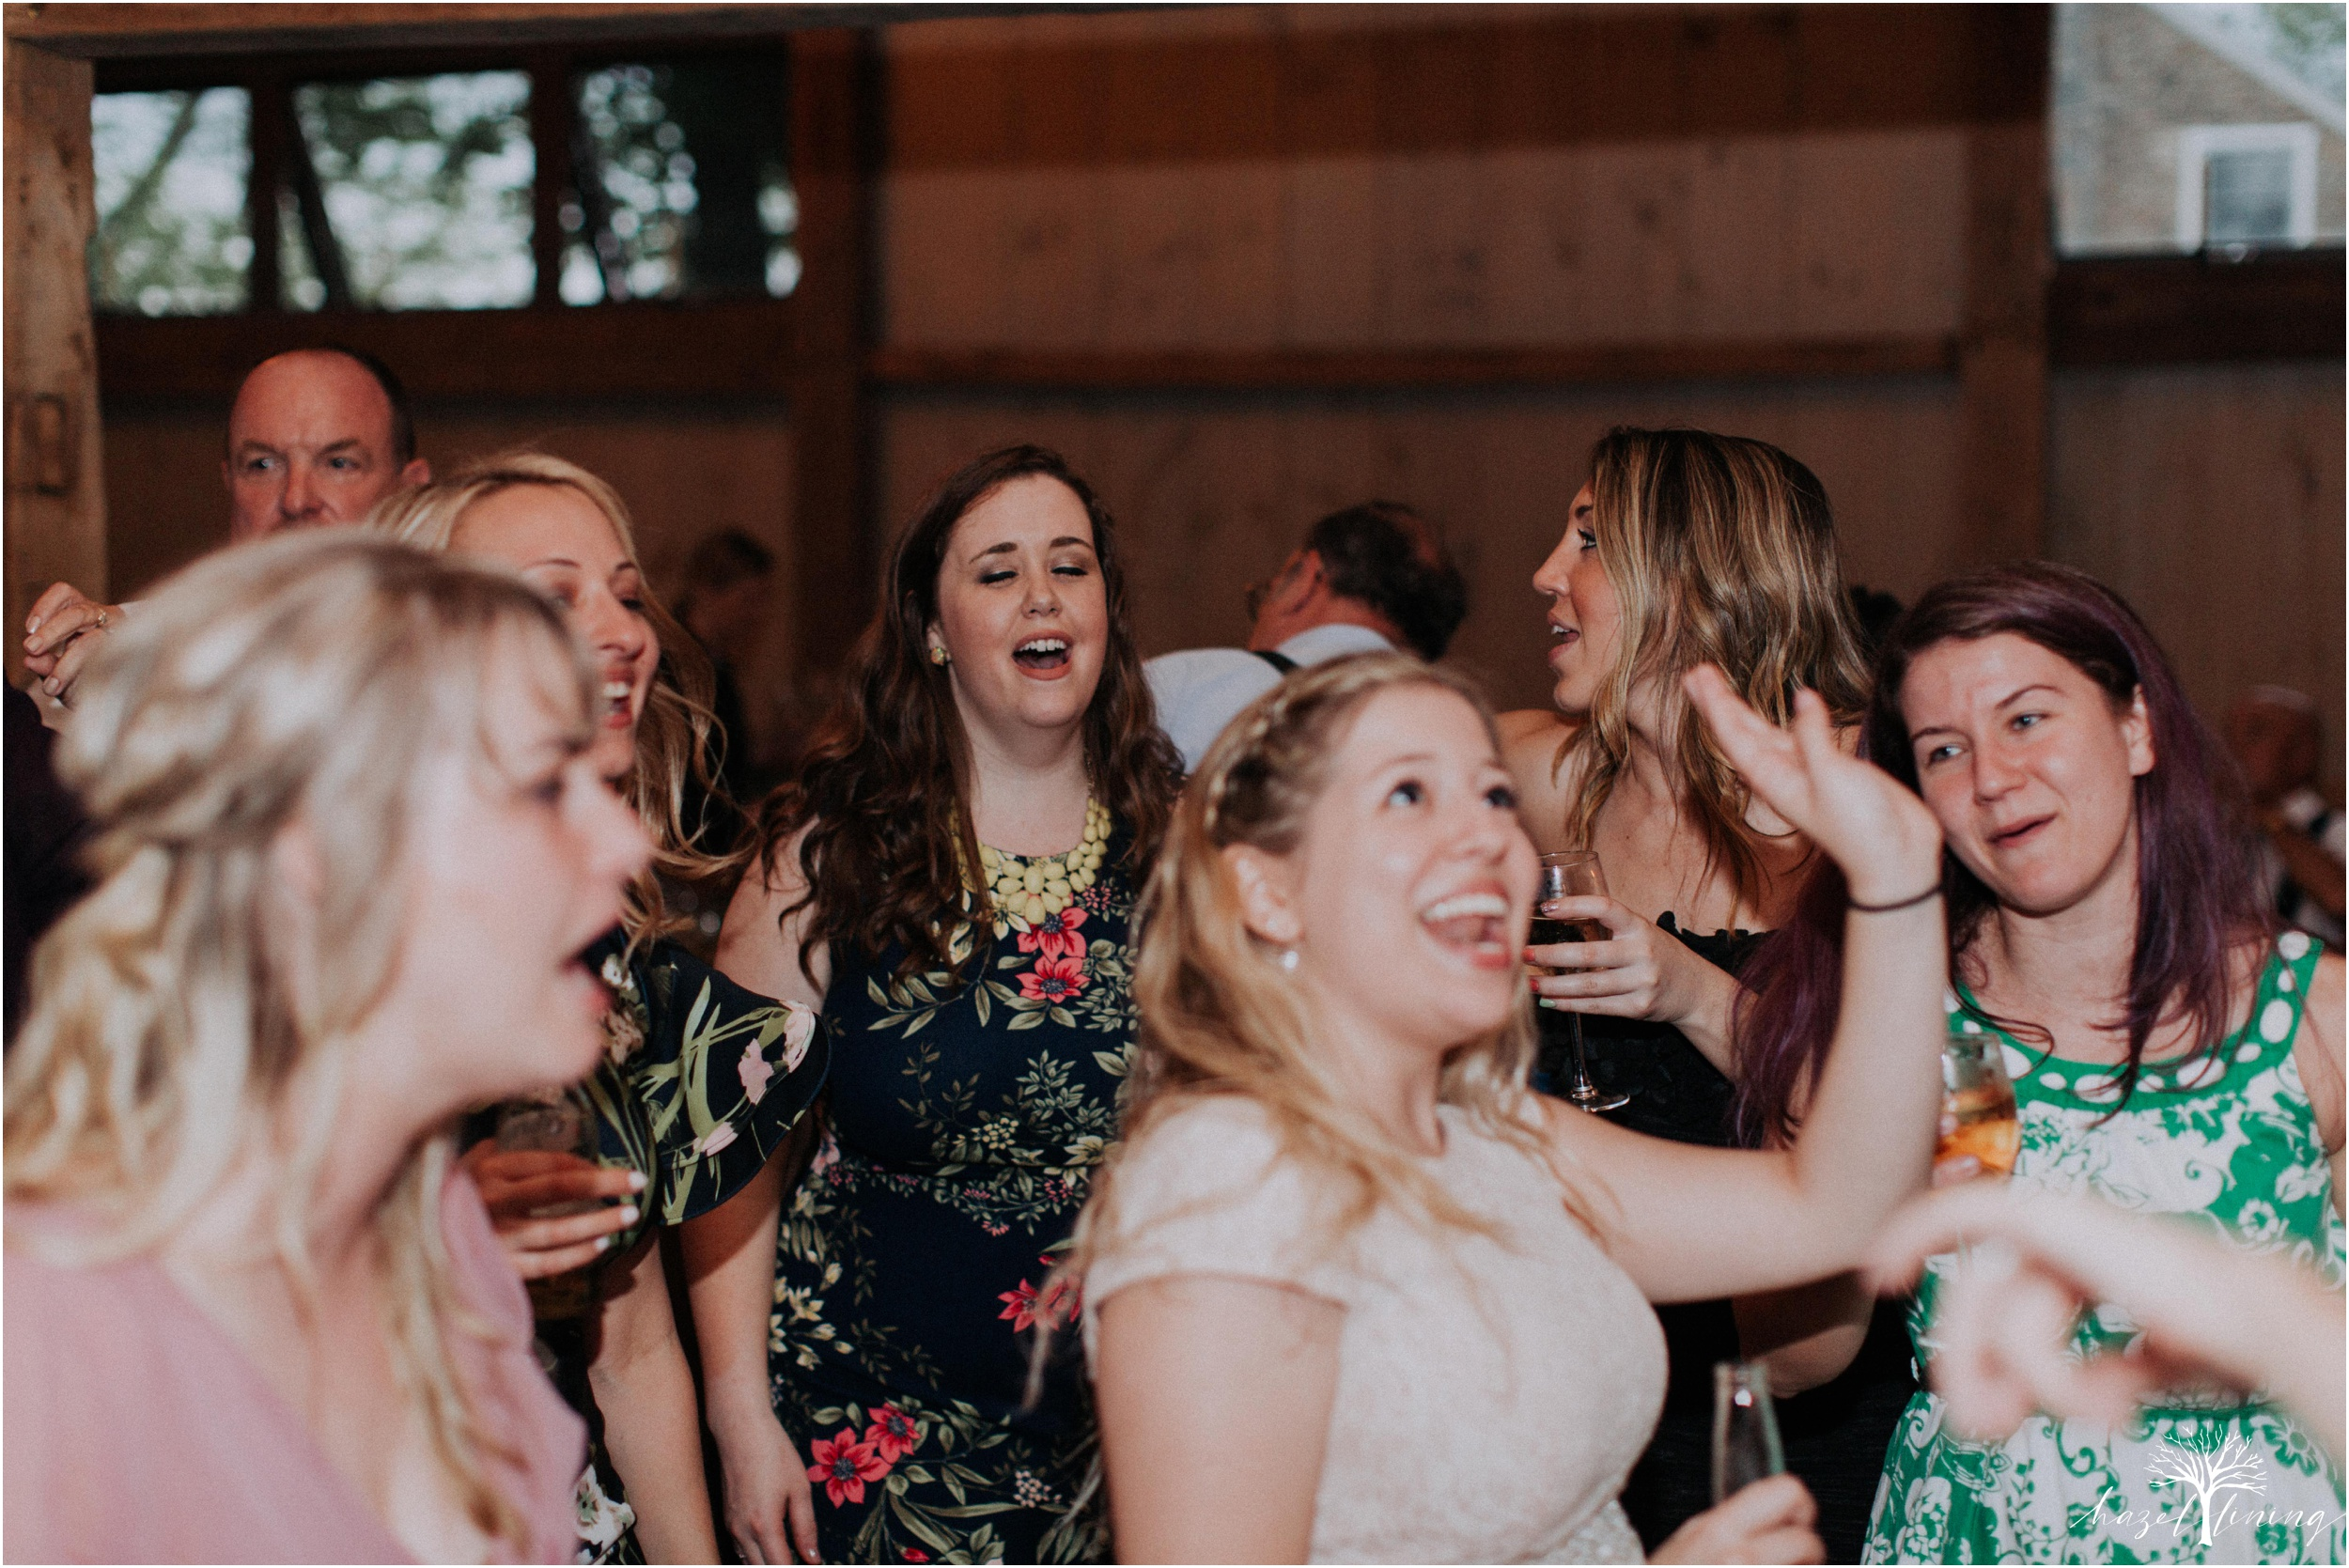 hazel-lining-travel-wedding-elopement-photography-lisa-landon-shoemaker-the-farm-bakery-and-events-bucks-county-quakertown-pennsylvania-summer-country-outdoor-farm-wedding_0158.jpg